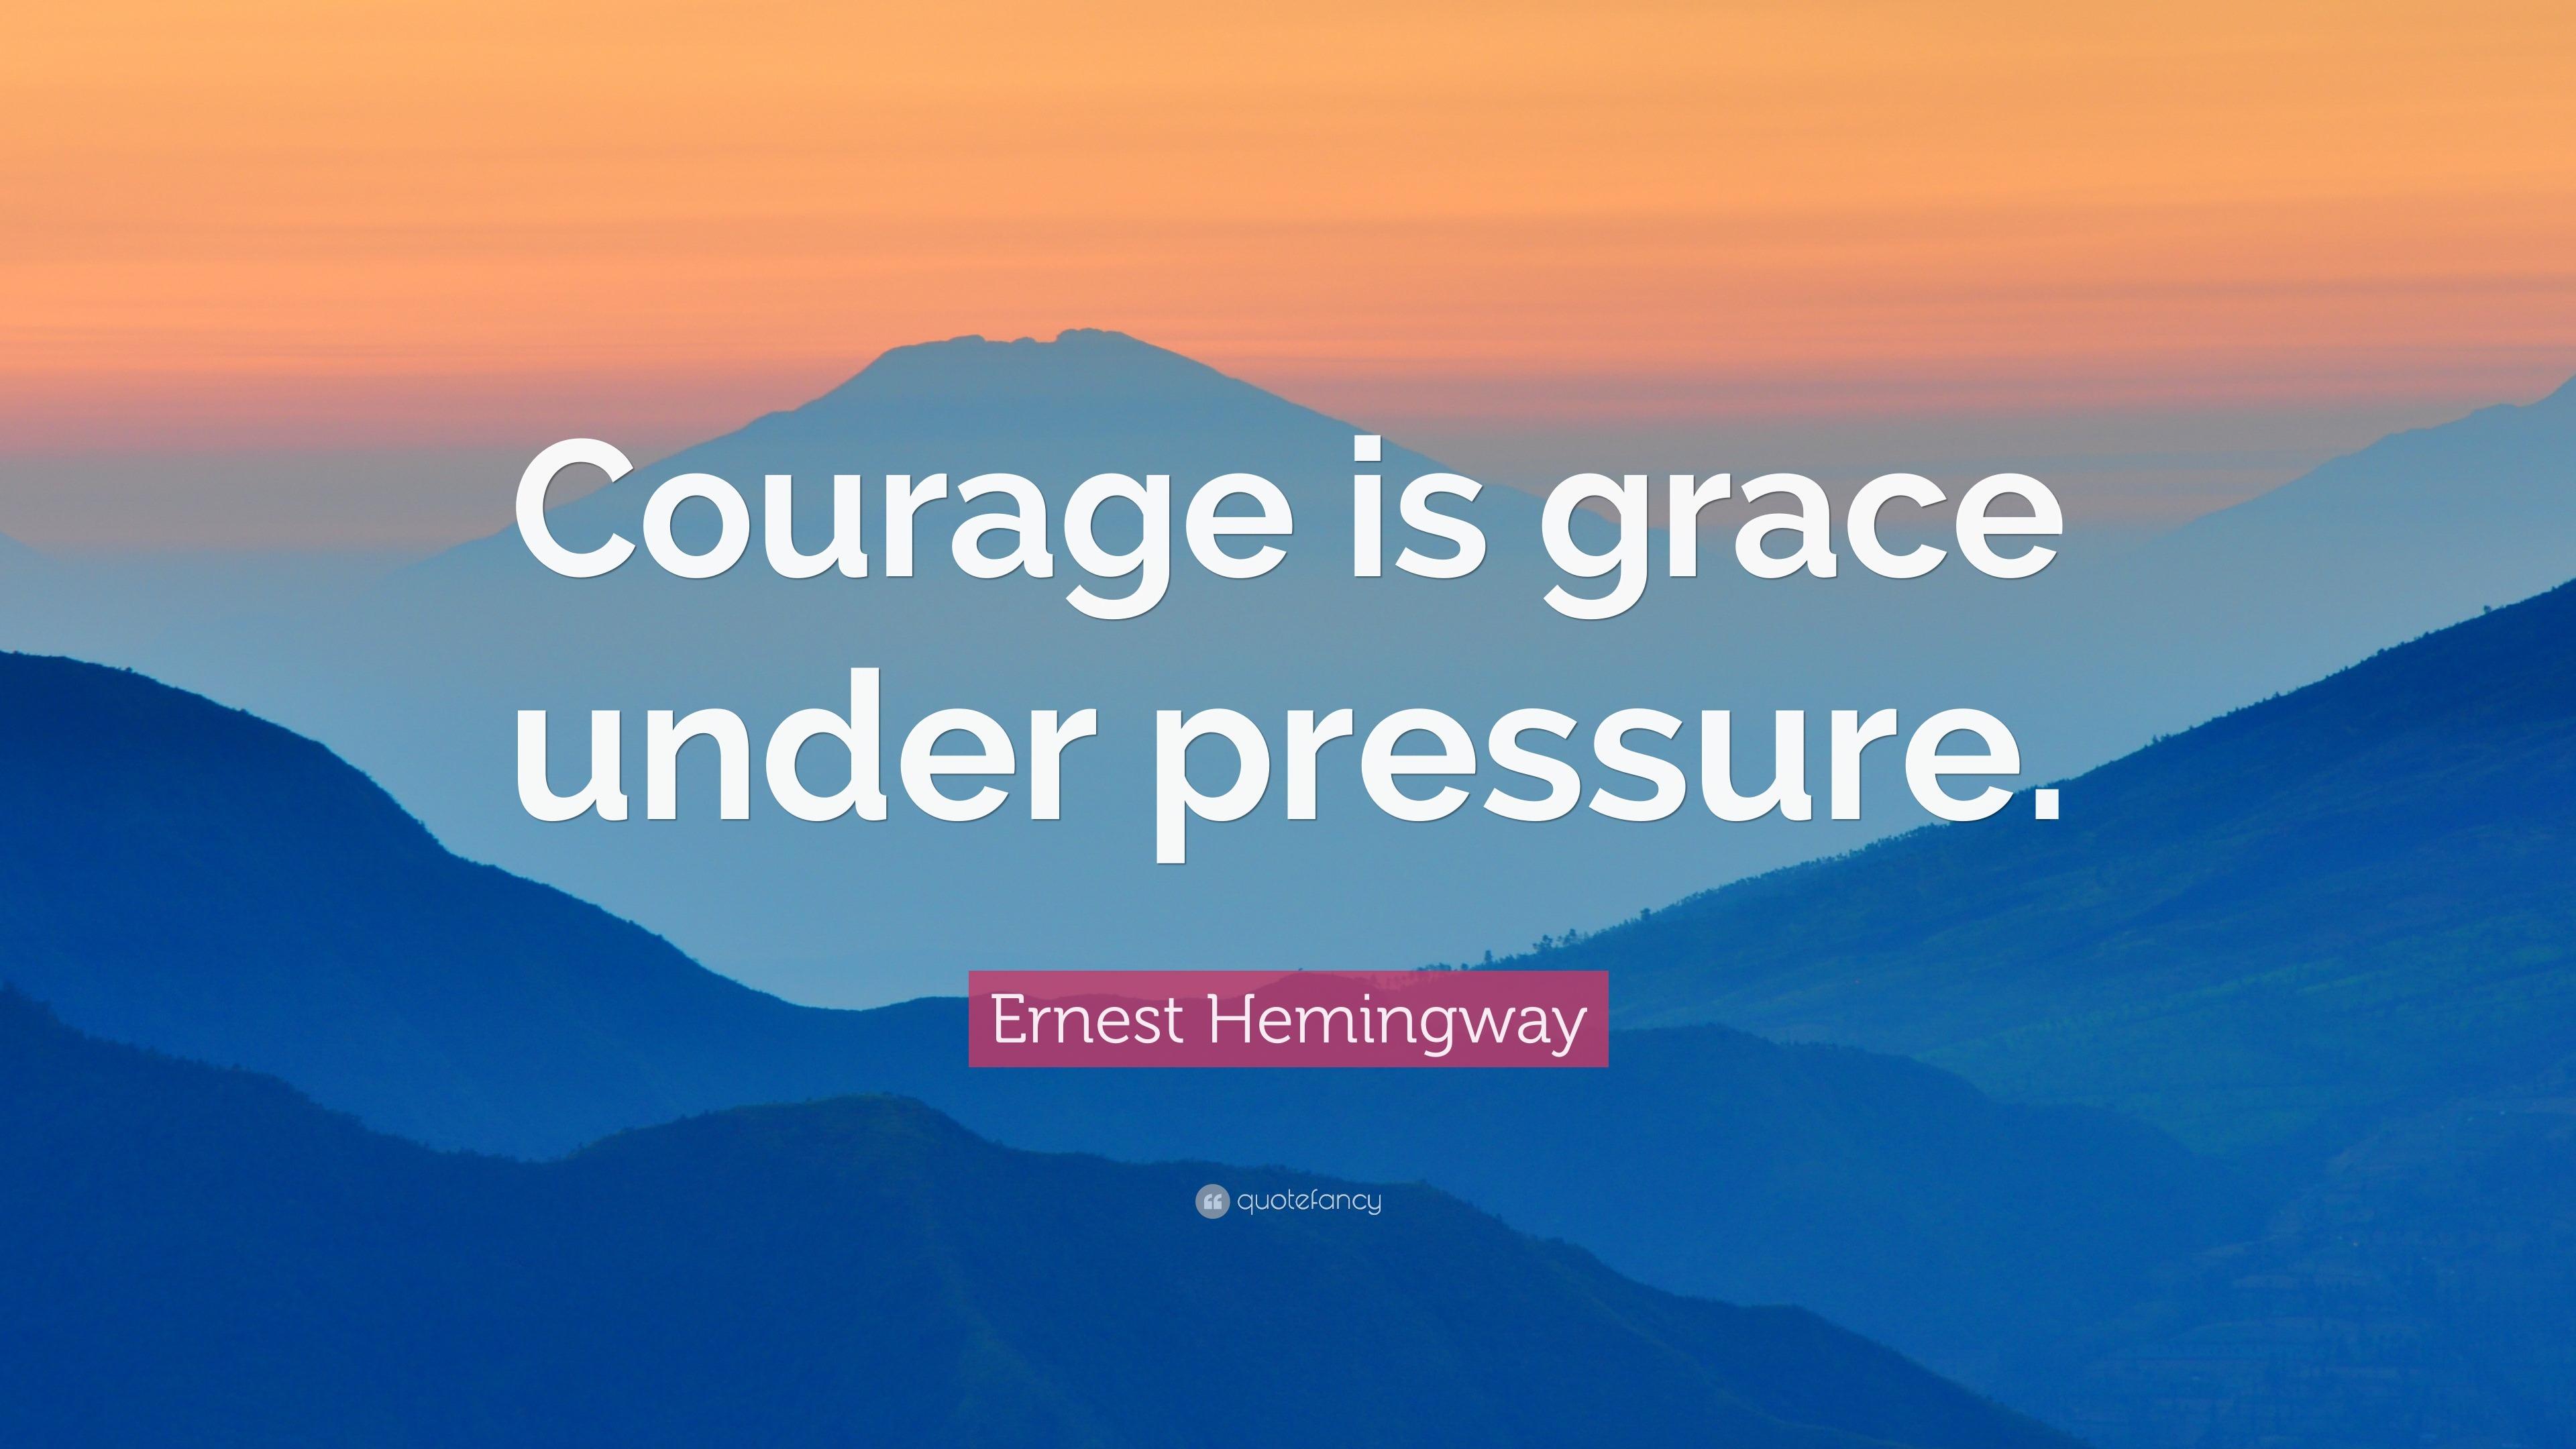 Casey Neistat Quotes Wallpaper Ernest Hemingway Quote Courage Is Grace Under Pressure